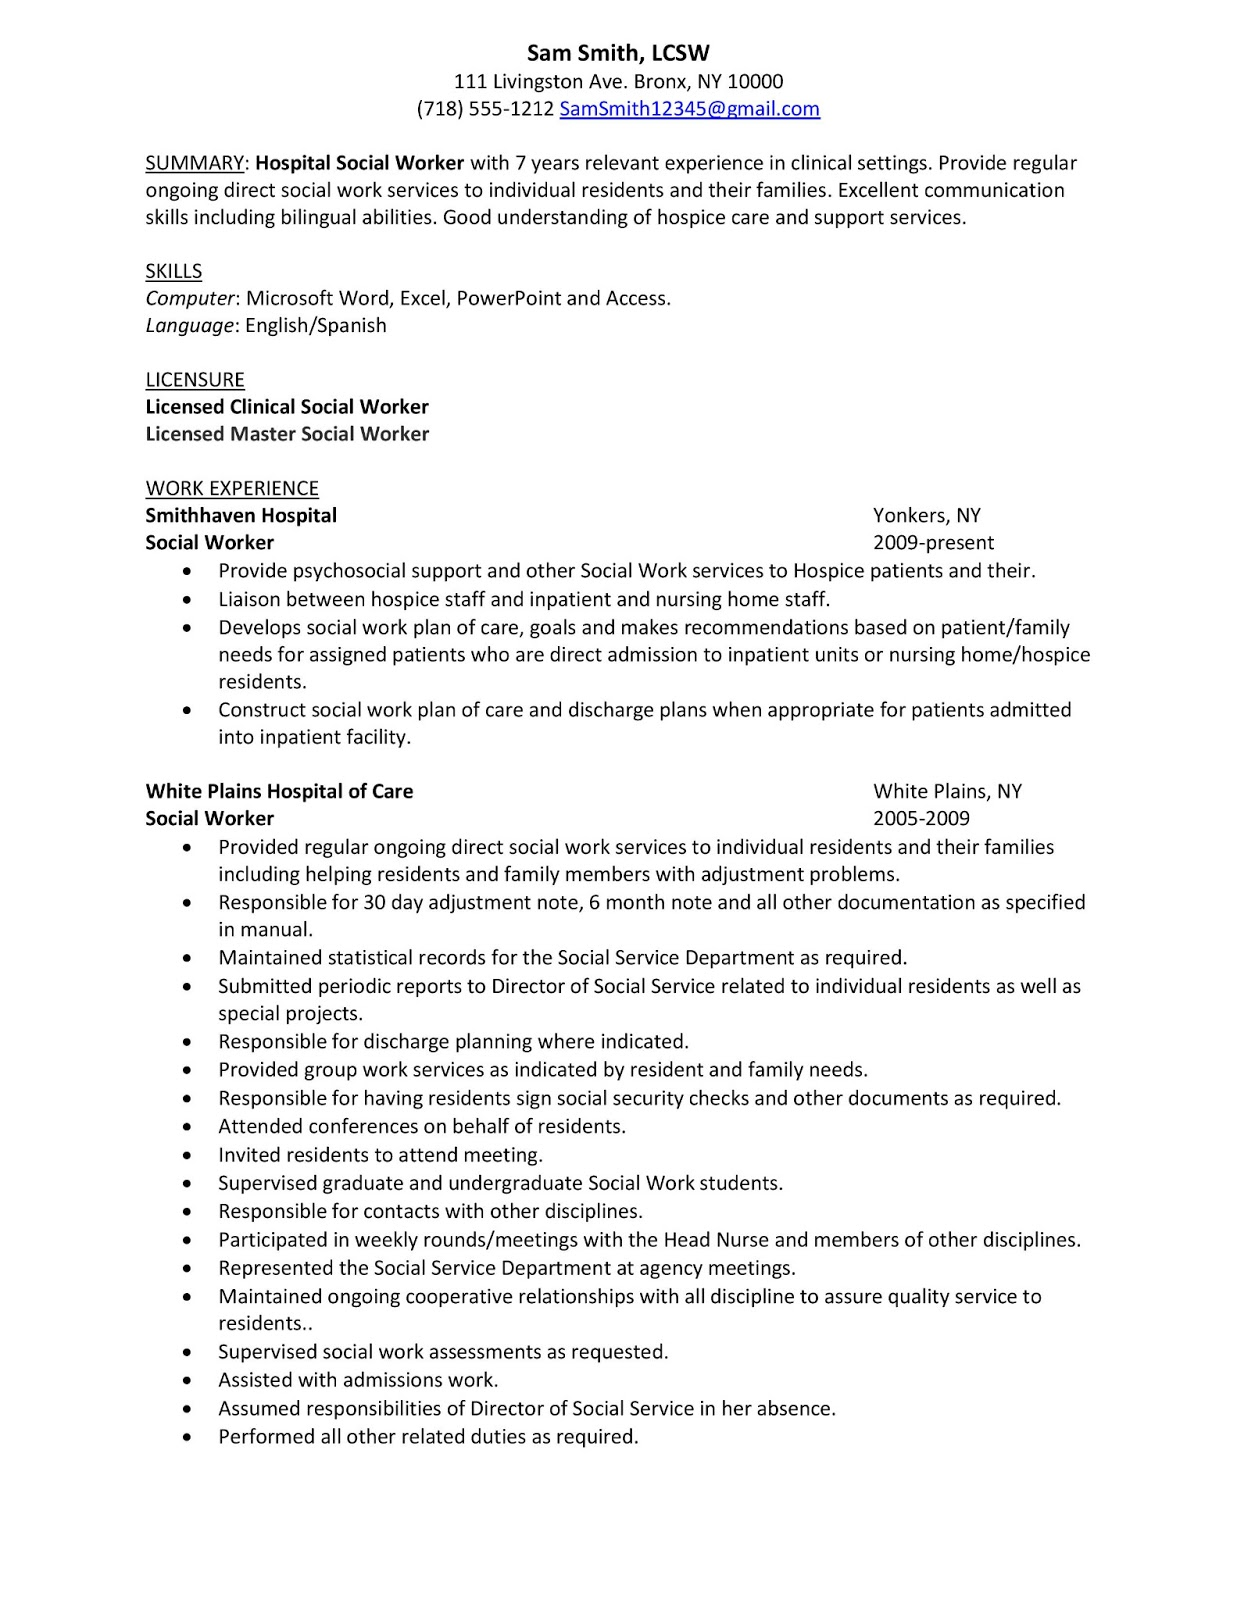 social work essays for grad school 91 121 113 106 social work essays for grad school